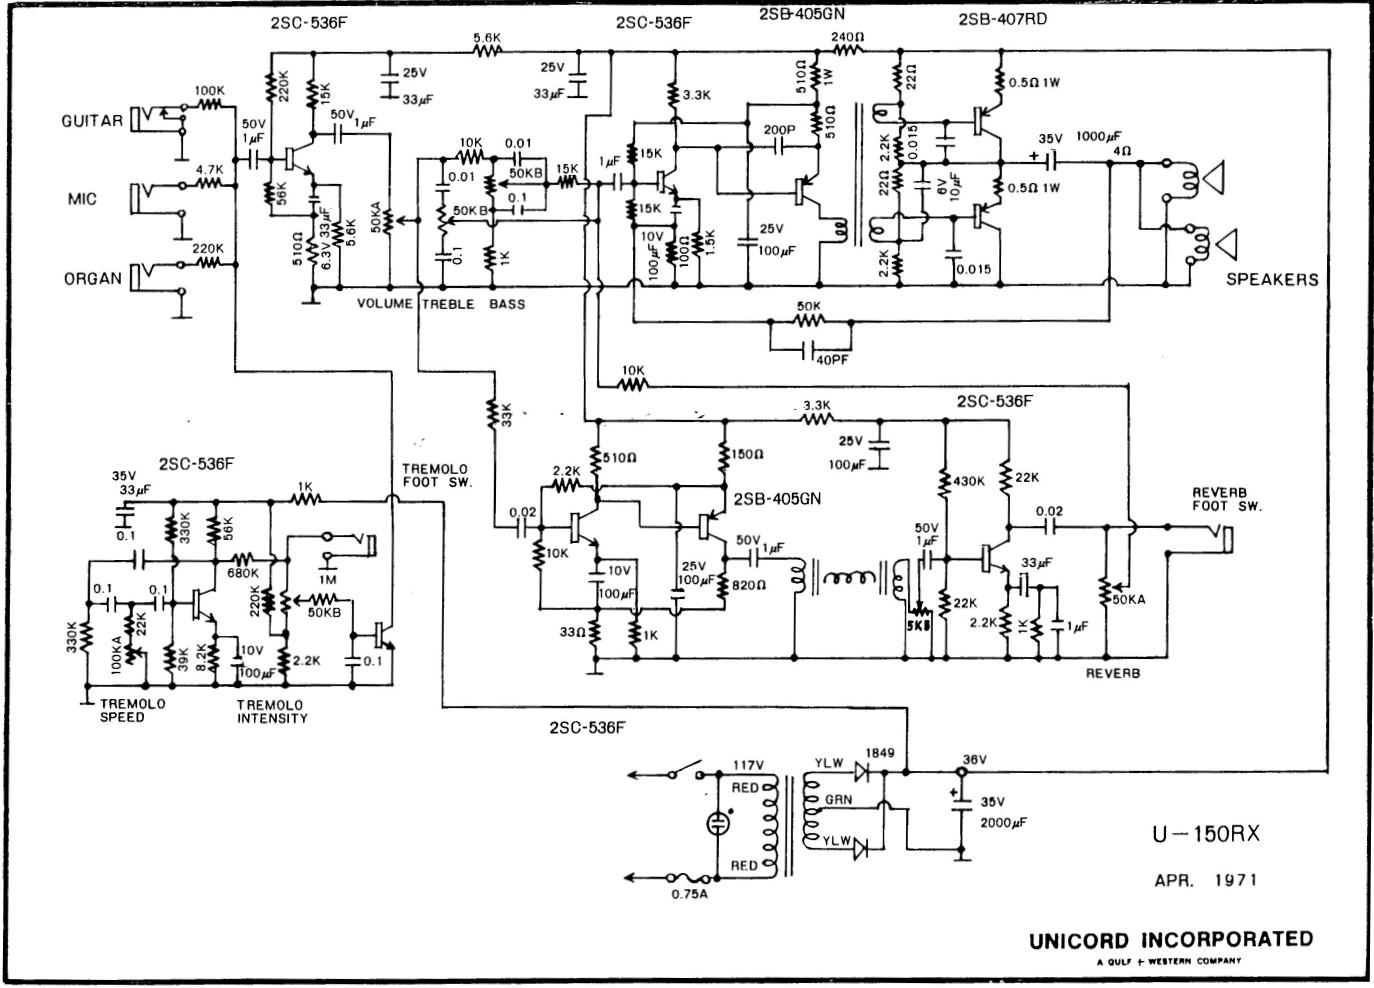 hight resolution of univox amp schematic wiring diagram todaysunivox amp schematic simple wiring diagram gibson falcon amp schematic need